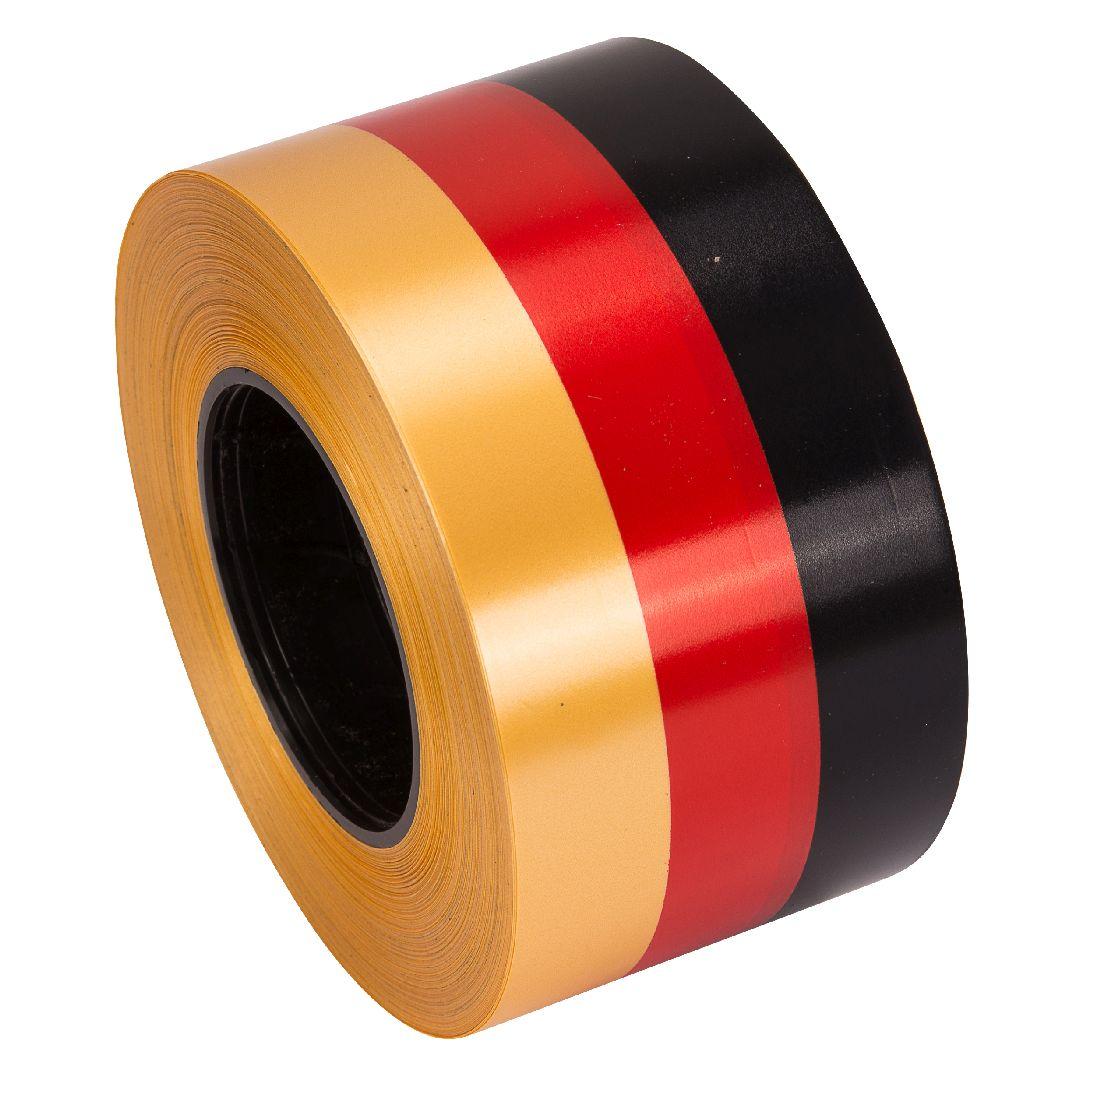 Polyband / Geschenkband Nationalband schwarz-rot-gold 80mm 100Meter Ziehband